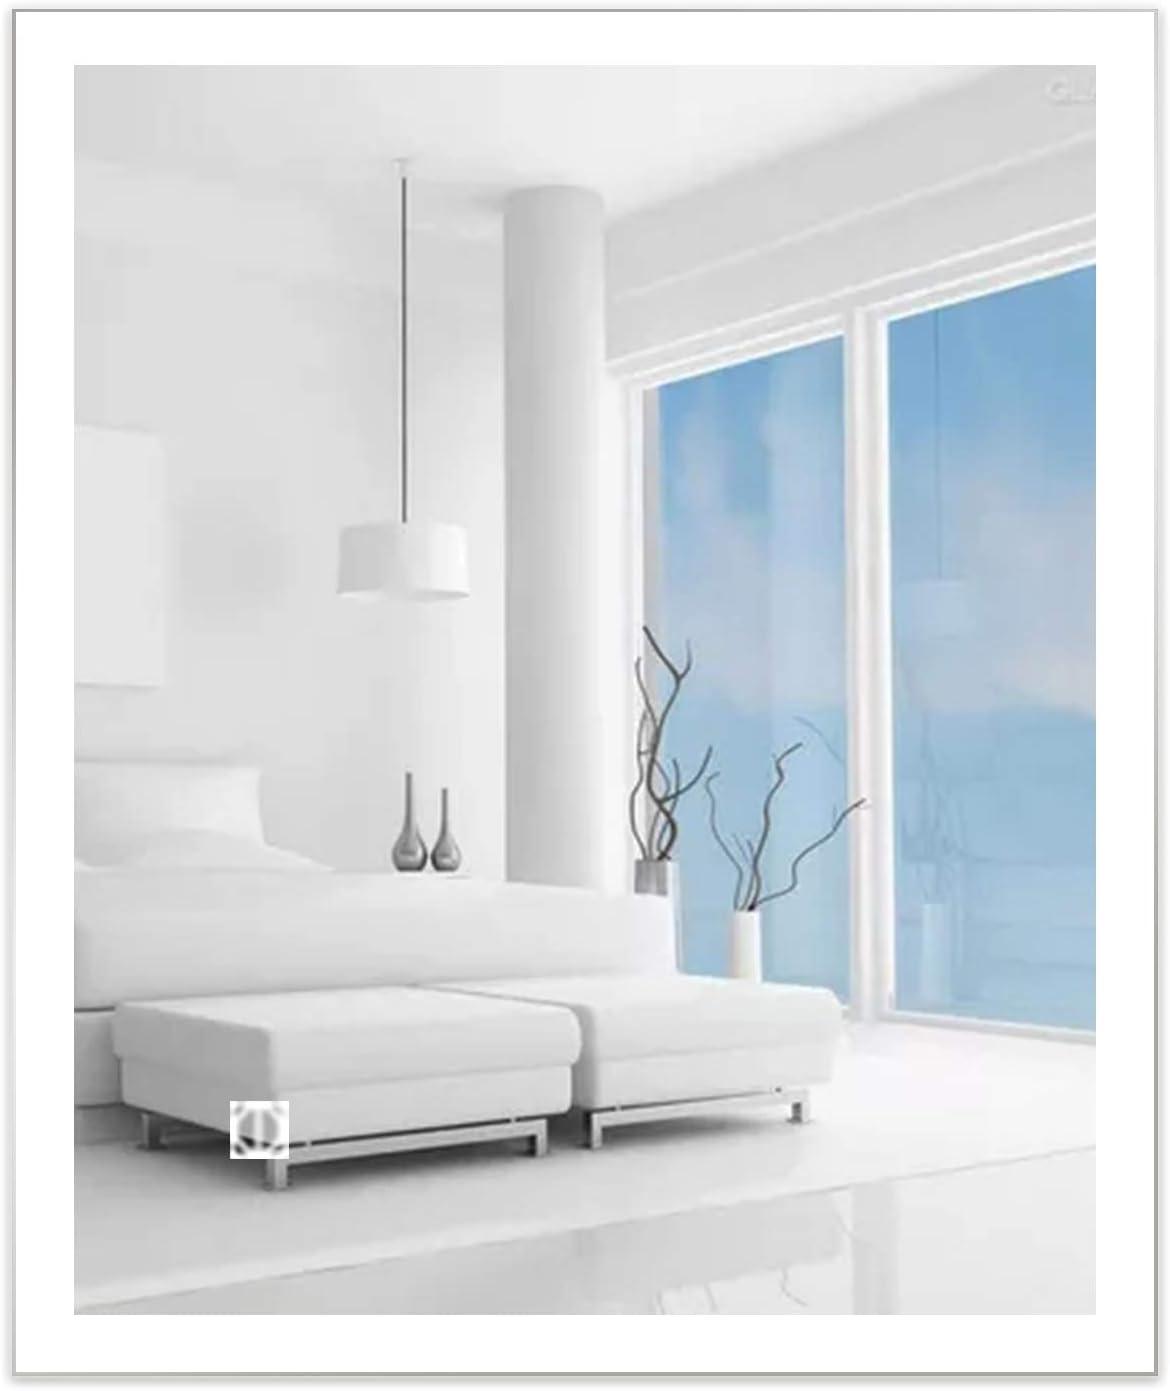 FANYUSHOW 28x36 Inch LED Backlit Vanity Very popular Credence à Mirror Bathroom